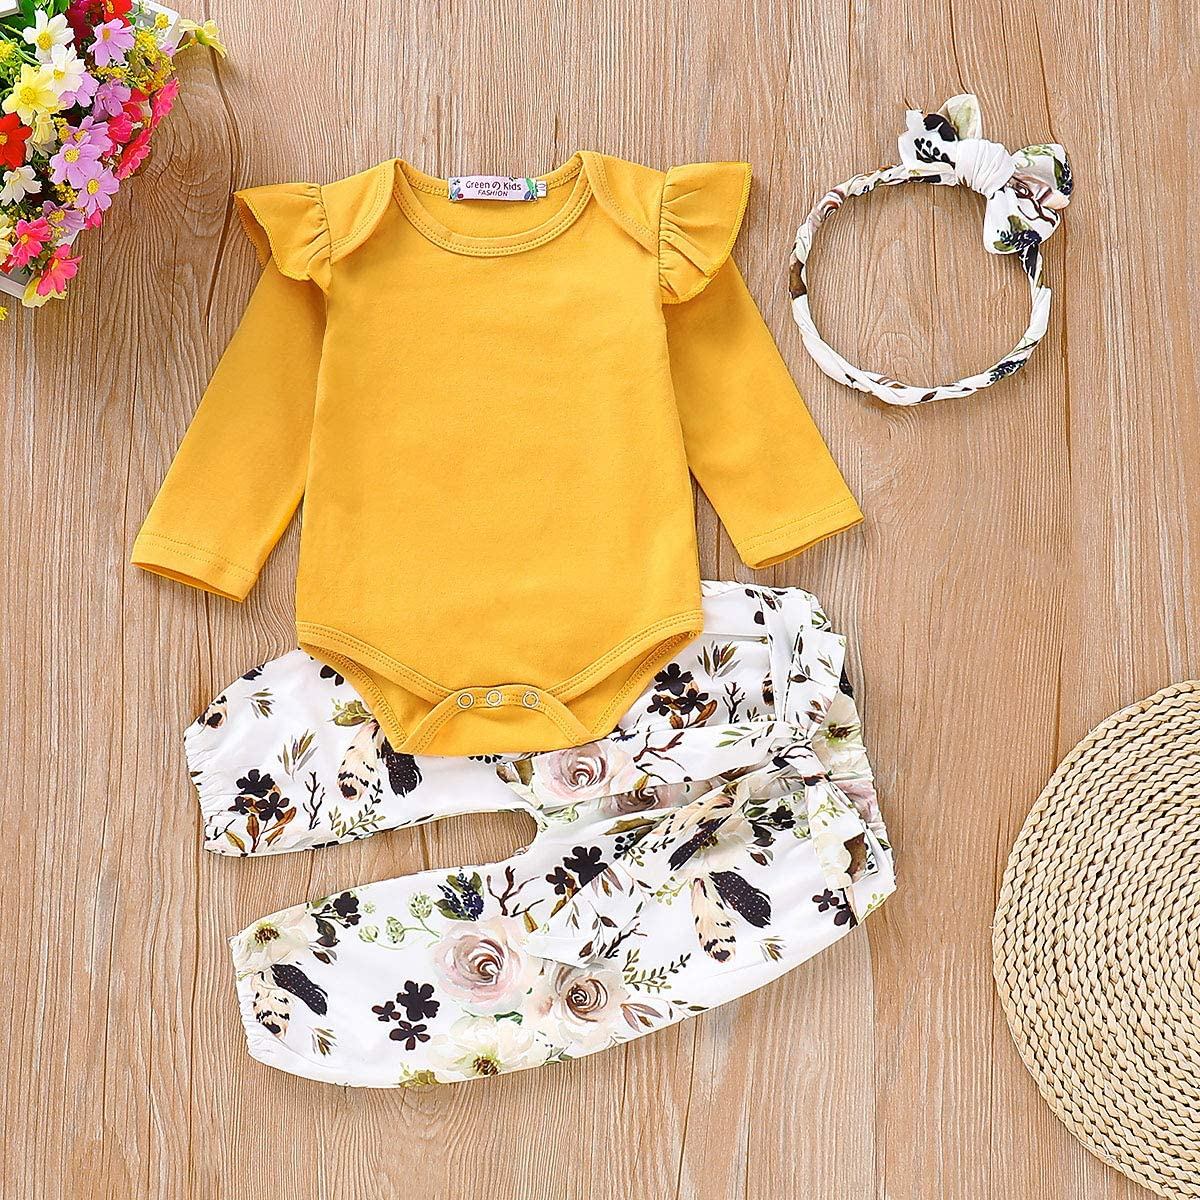 Newborn Toddler Baby Girl Kids Long Sleeve Ruffle Flower Romper Bodysuit Clothes